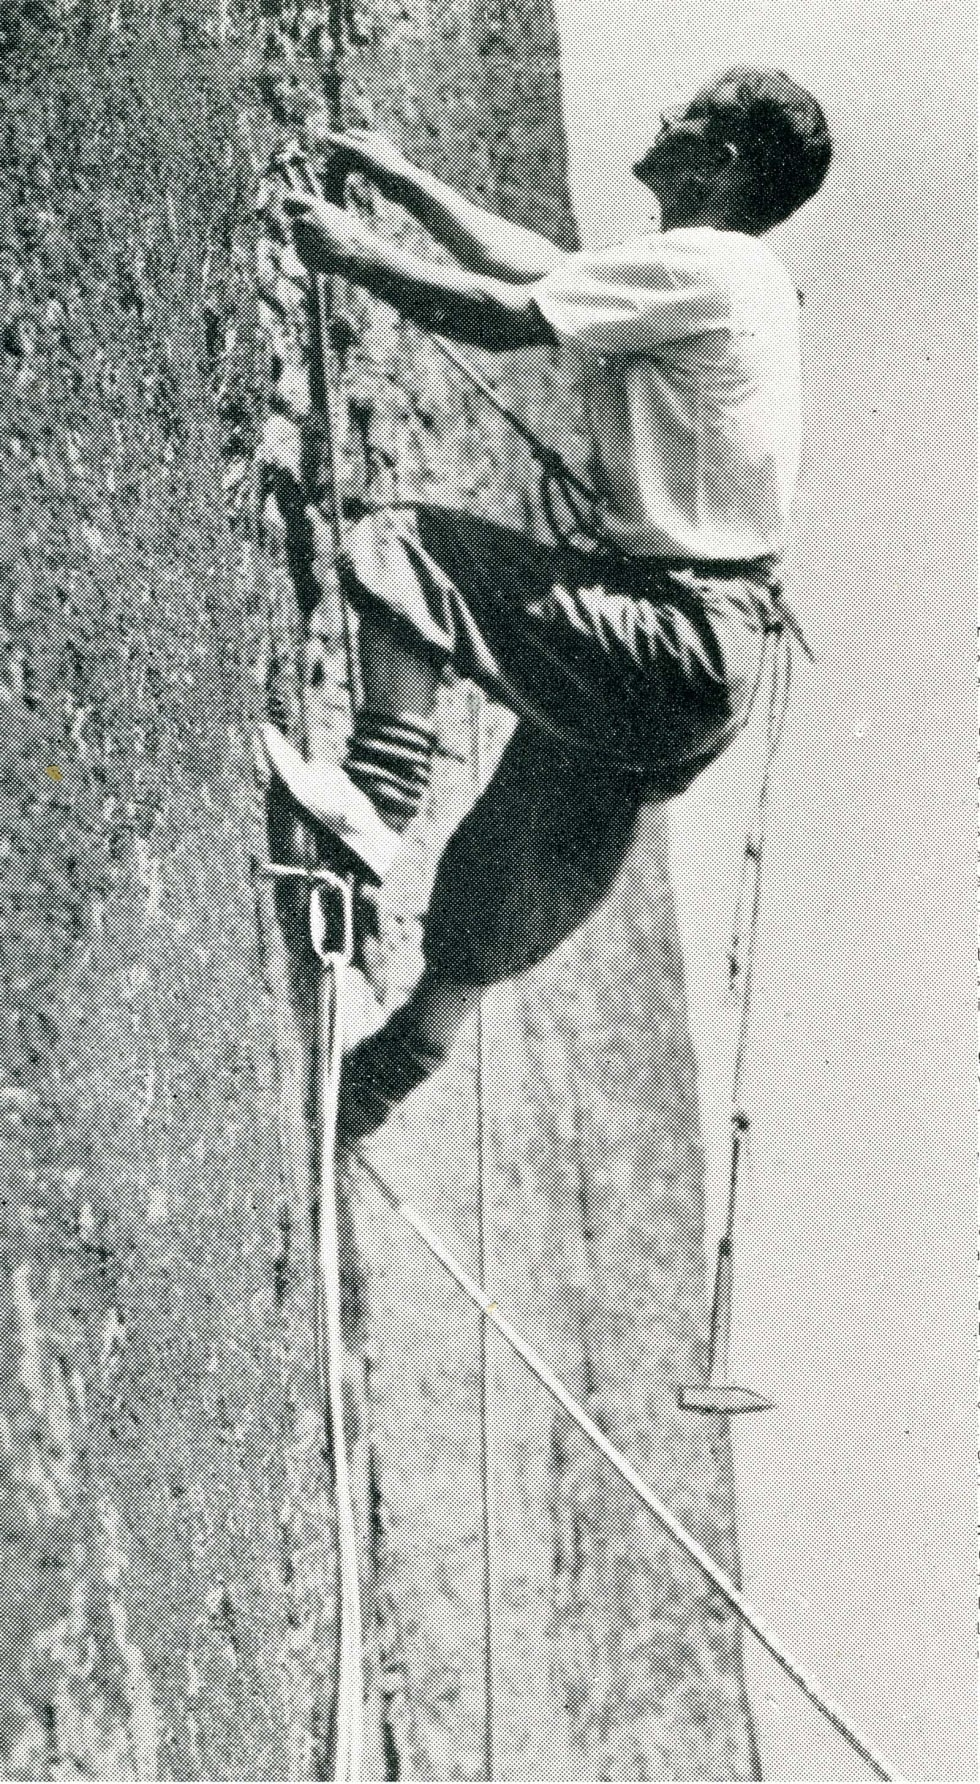 Teknisk: Bolteklatring på Bolterisset (6) i Østveggen. Foto: Fra Friluftsboka (1941)